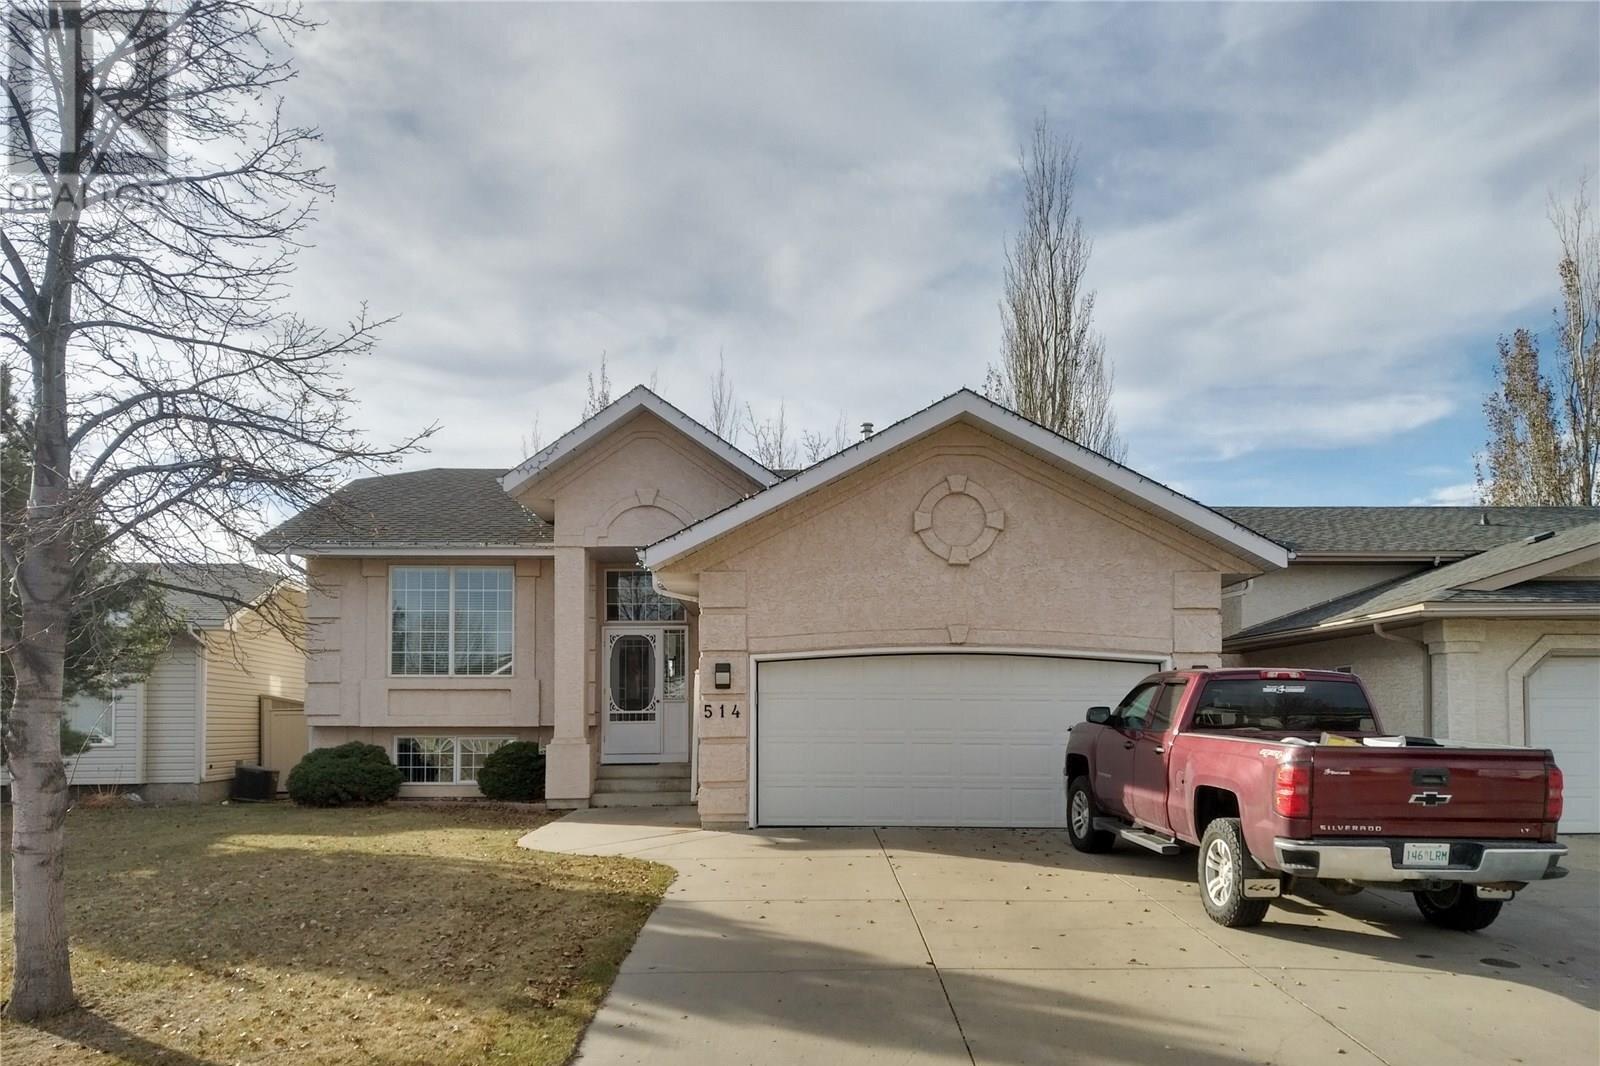 House for sale at 514 Haslam Cres Saskatoon Saskatchewan - MLS: SK839214